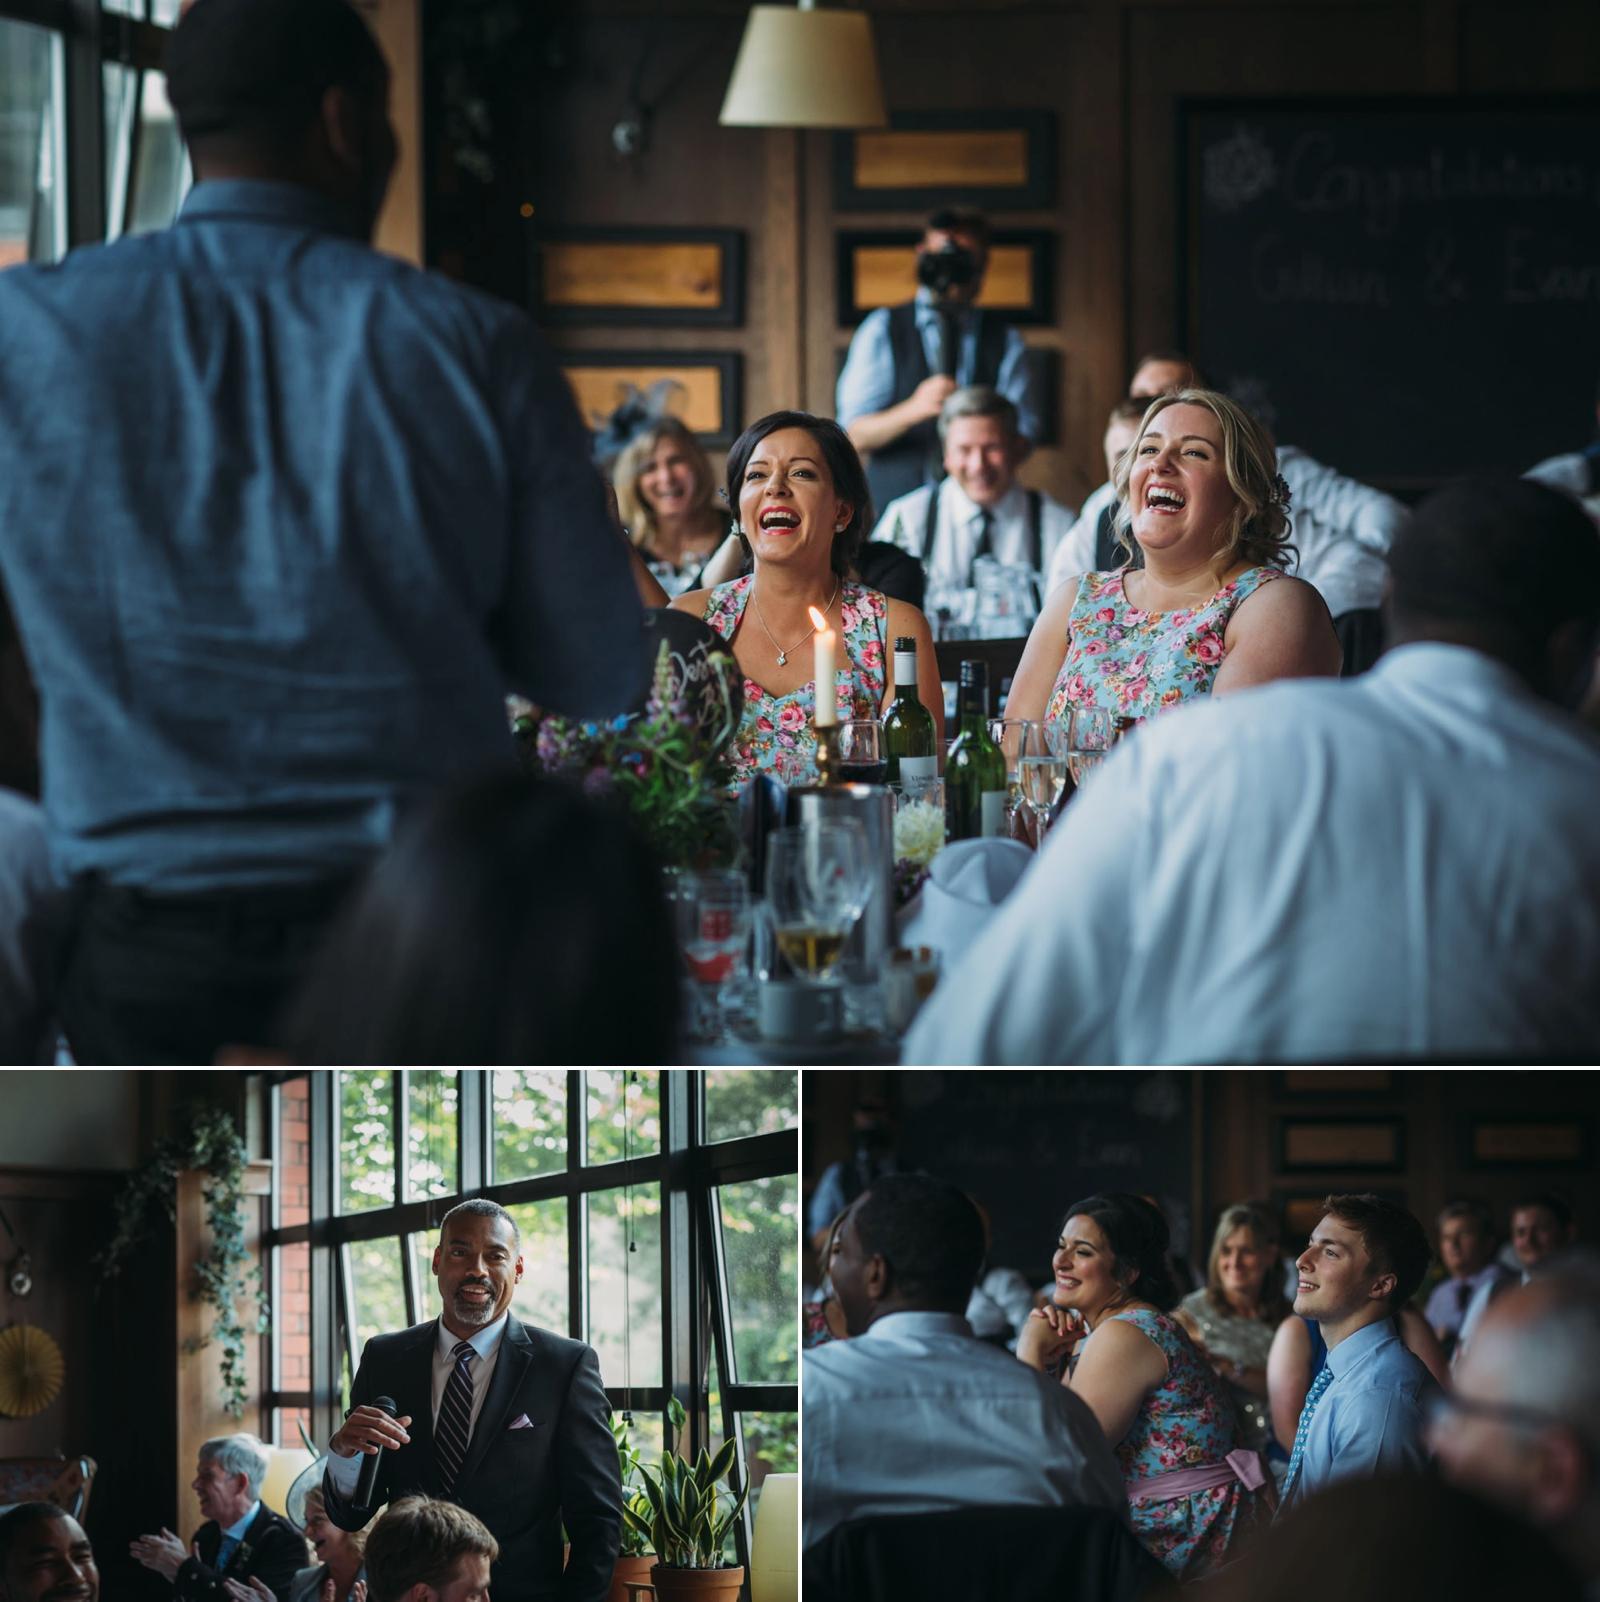 Gillian-Evan-West-Brewery-Jo-Donaldson-Photography-528.jpg